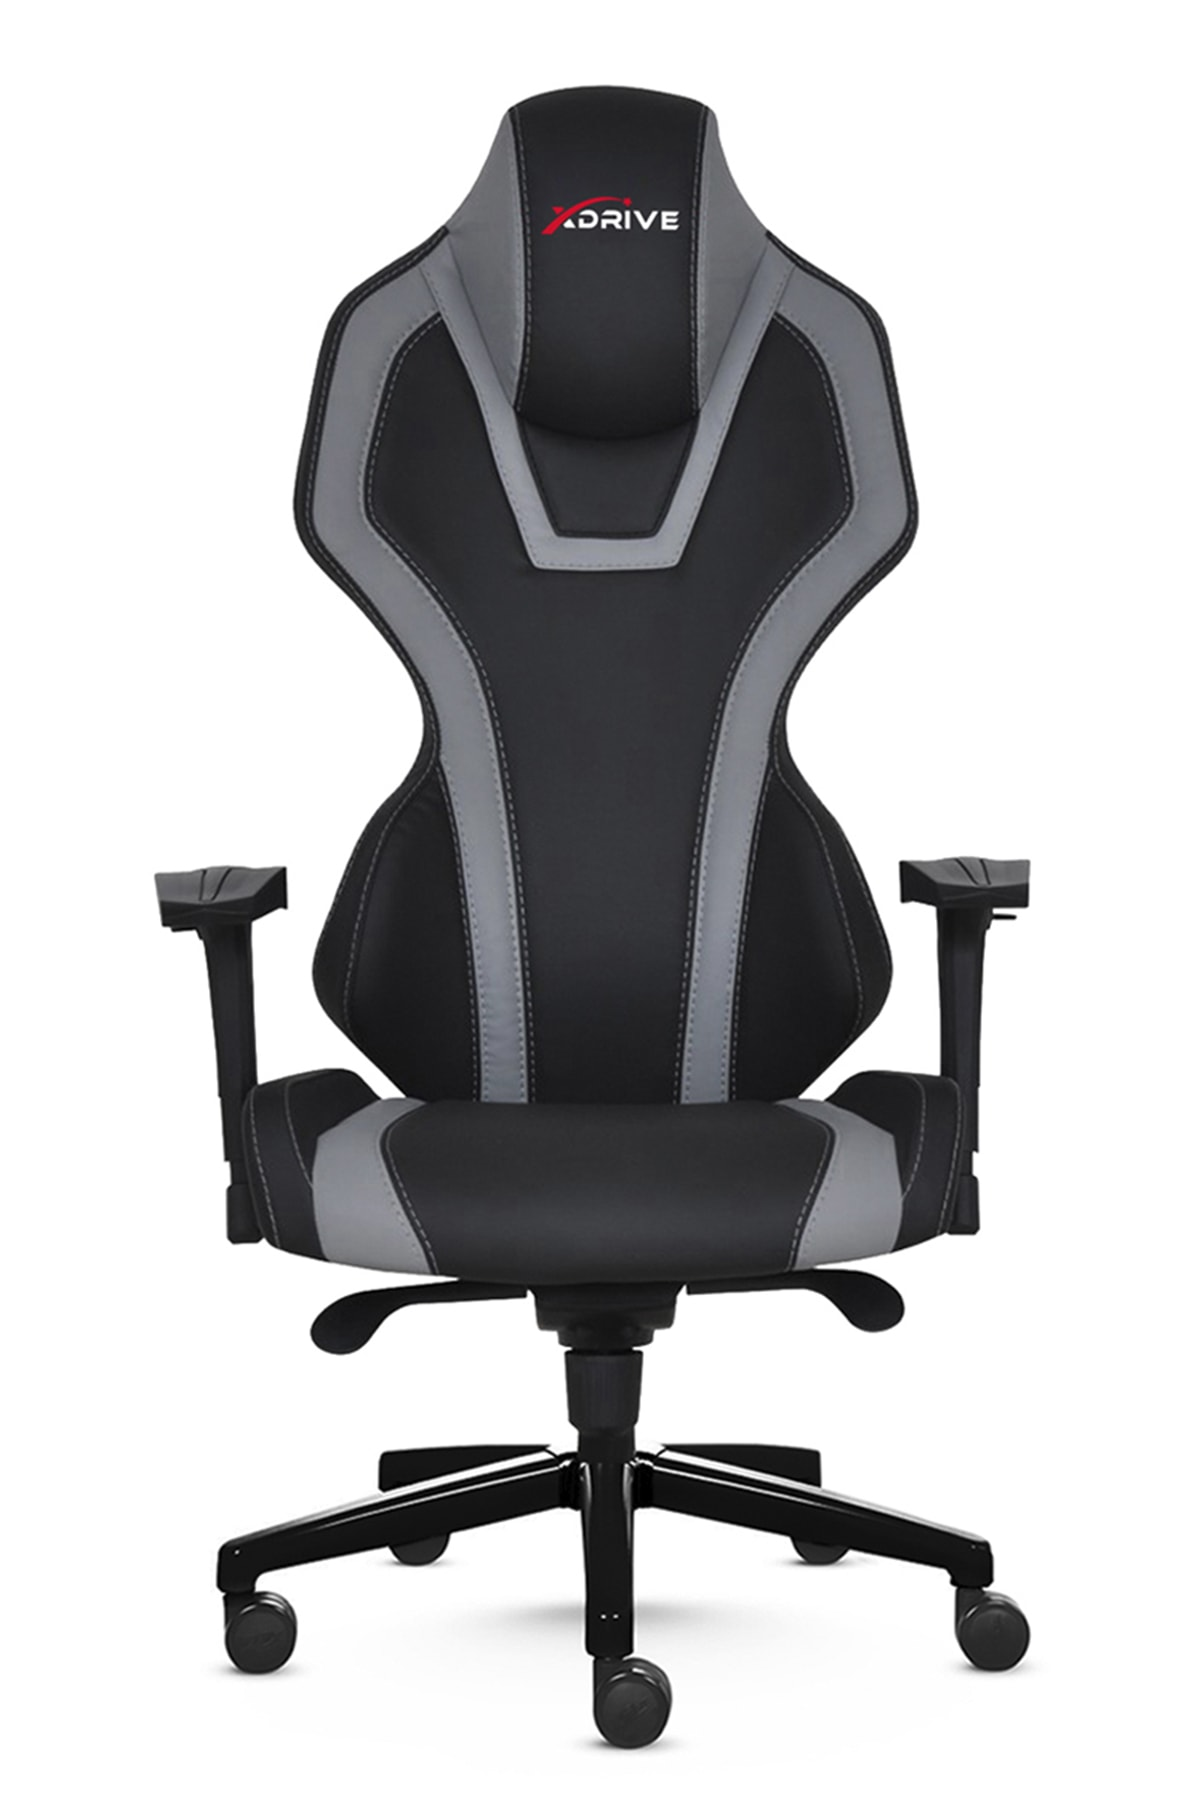 XDrive Bora Profesyonel Oyuncu Koltuğu Gri/siyah 0